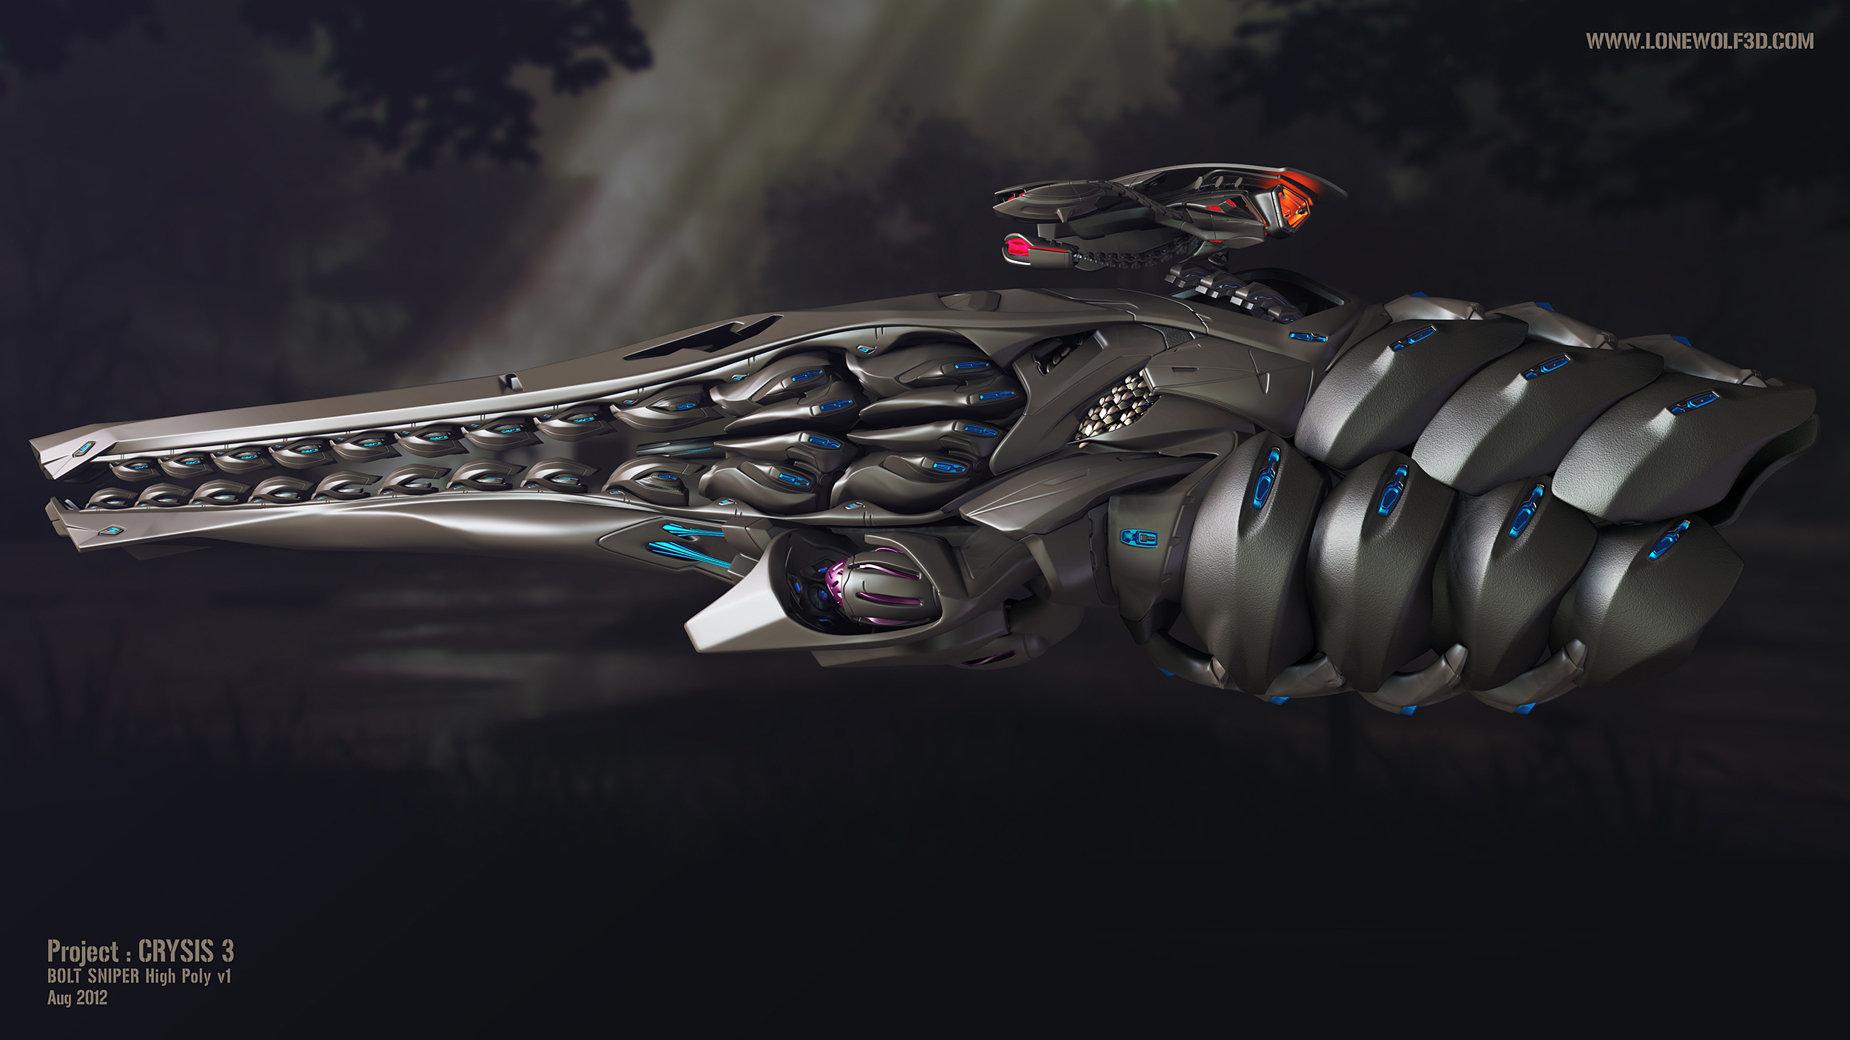 Crysis3 bolt lightning side